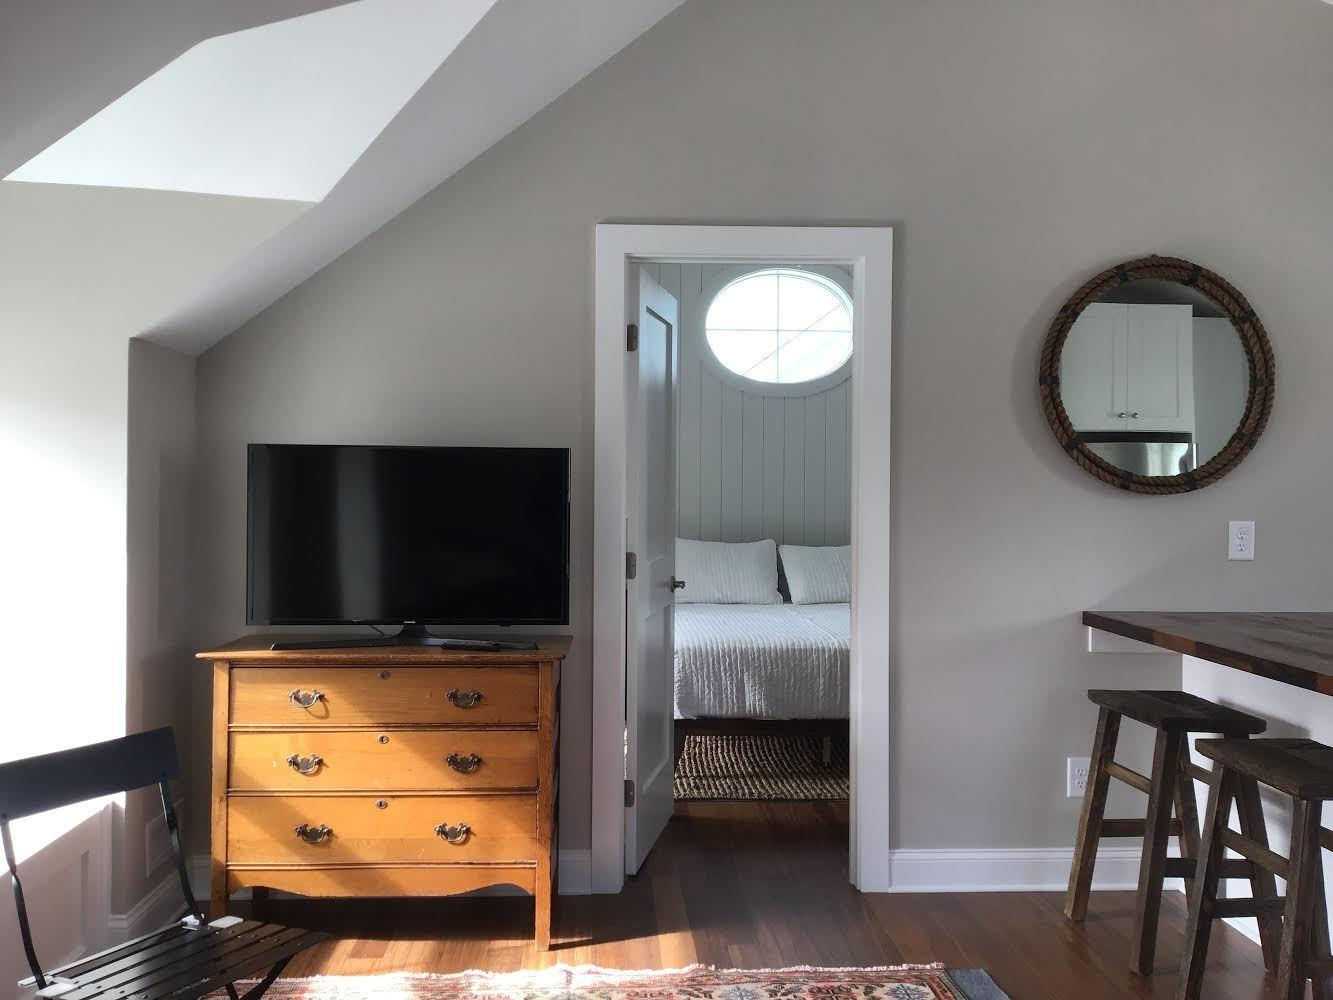 Old Mt Pleasant Homes For Sale - 542 Center, Mount Pleasant, SC - 2